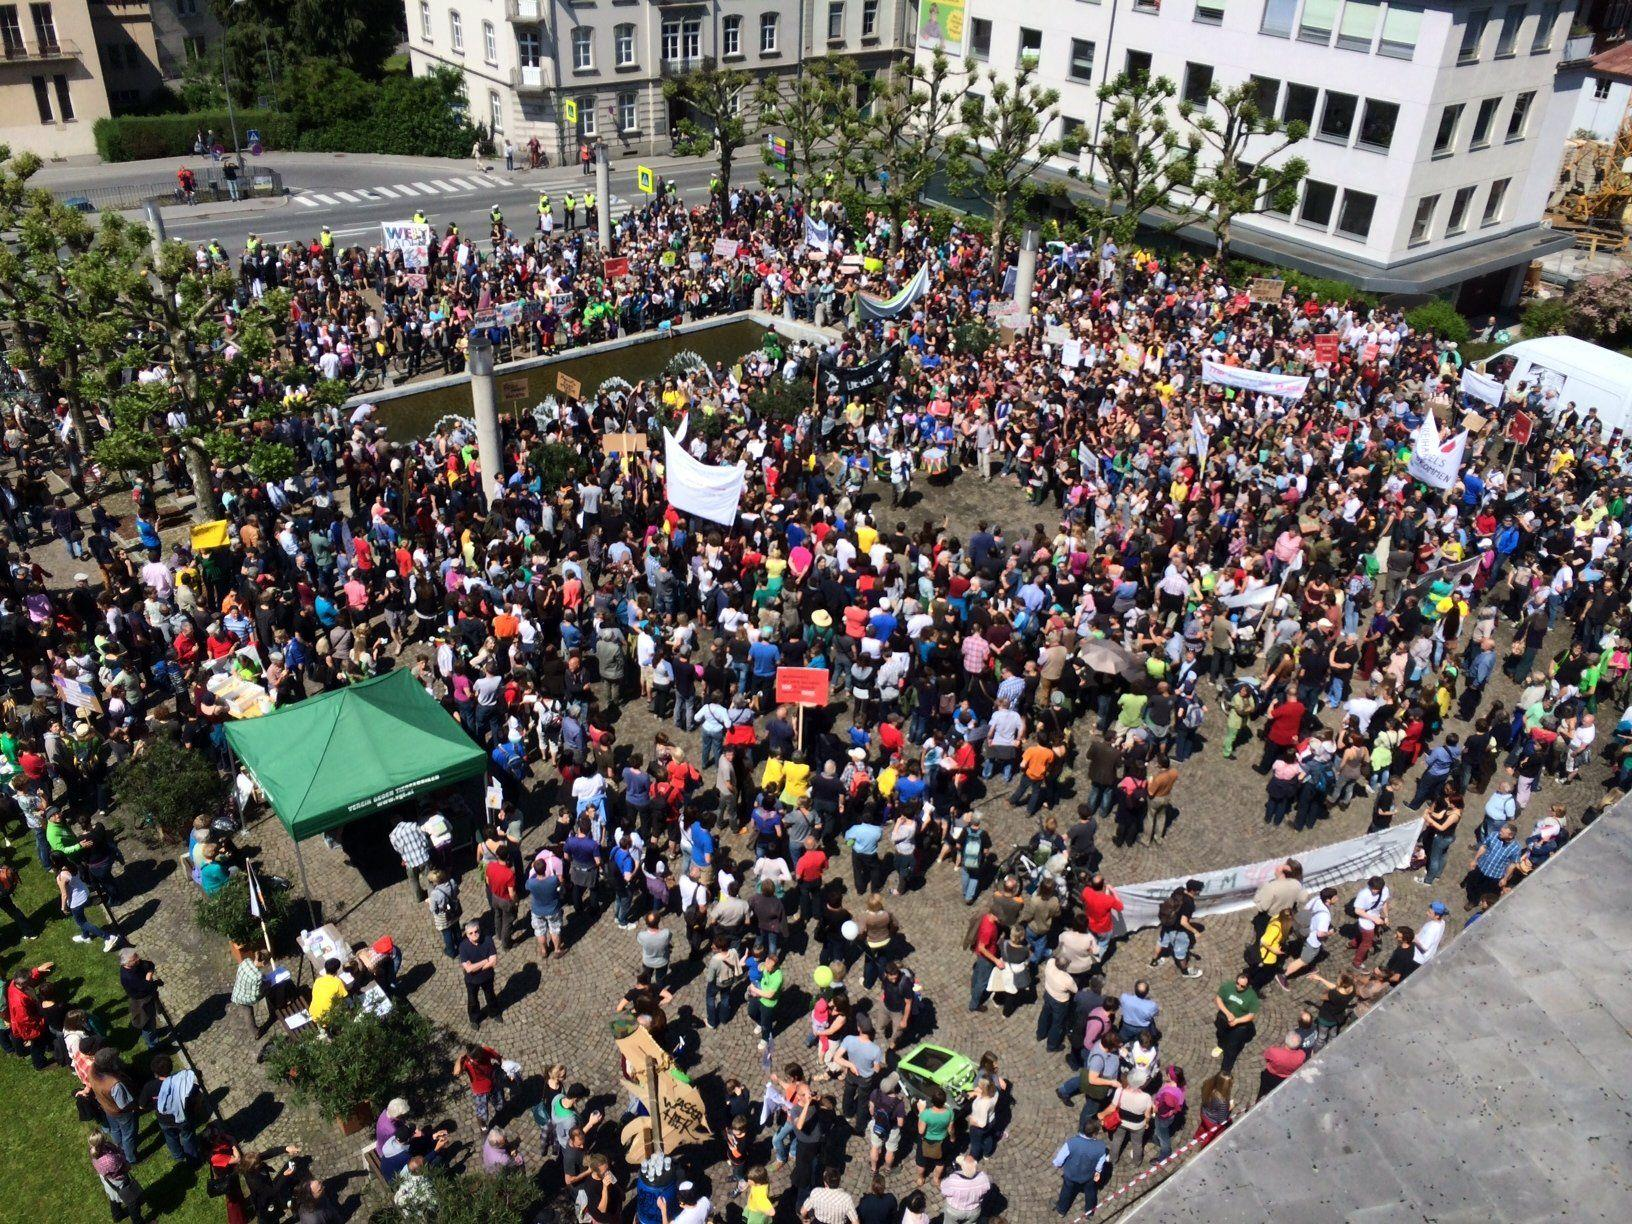 Hunderte beteiligten sich am Marsch.